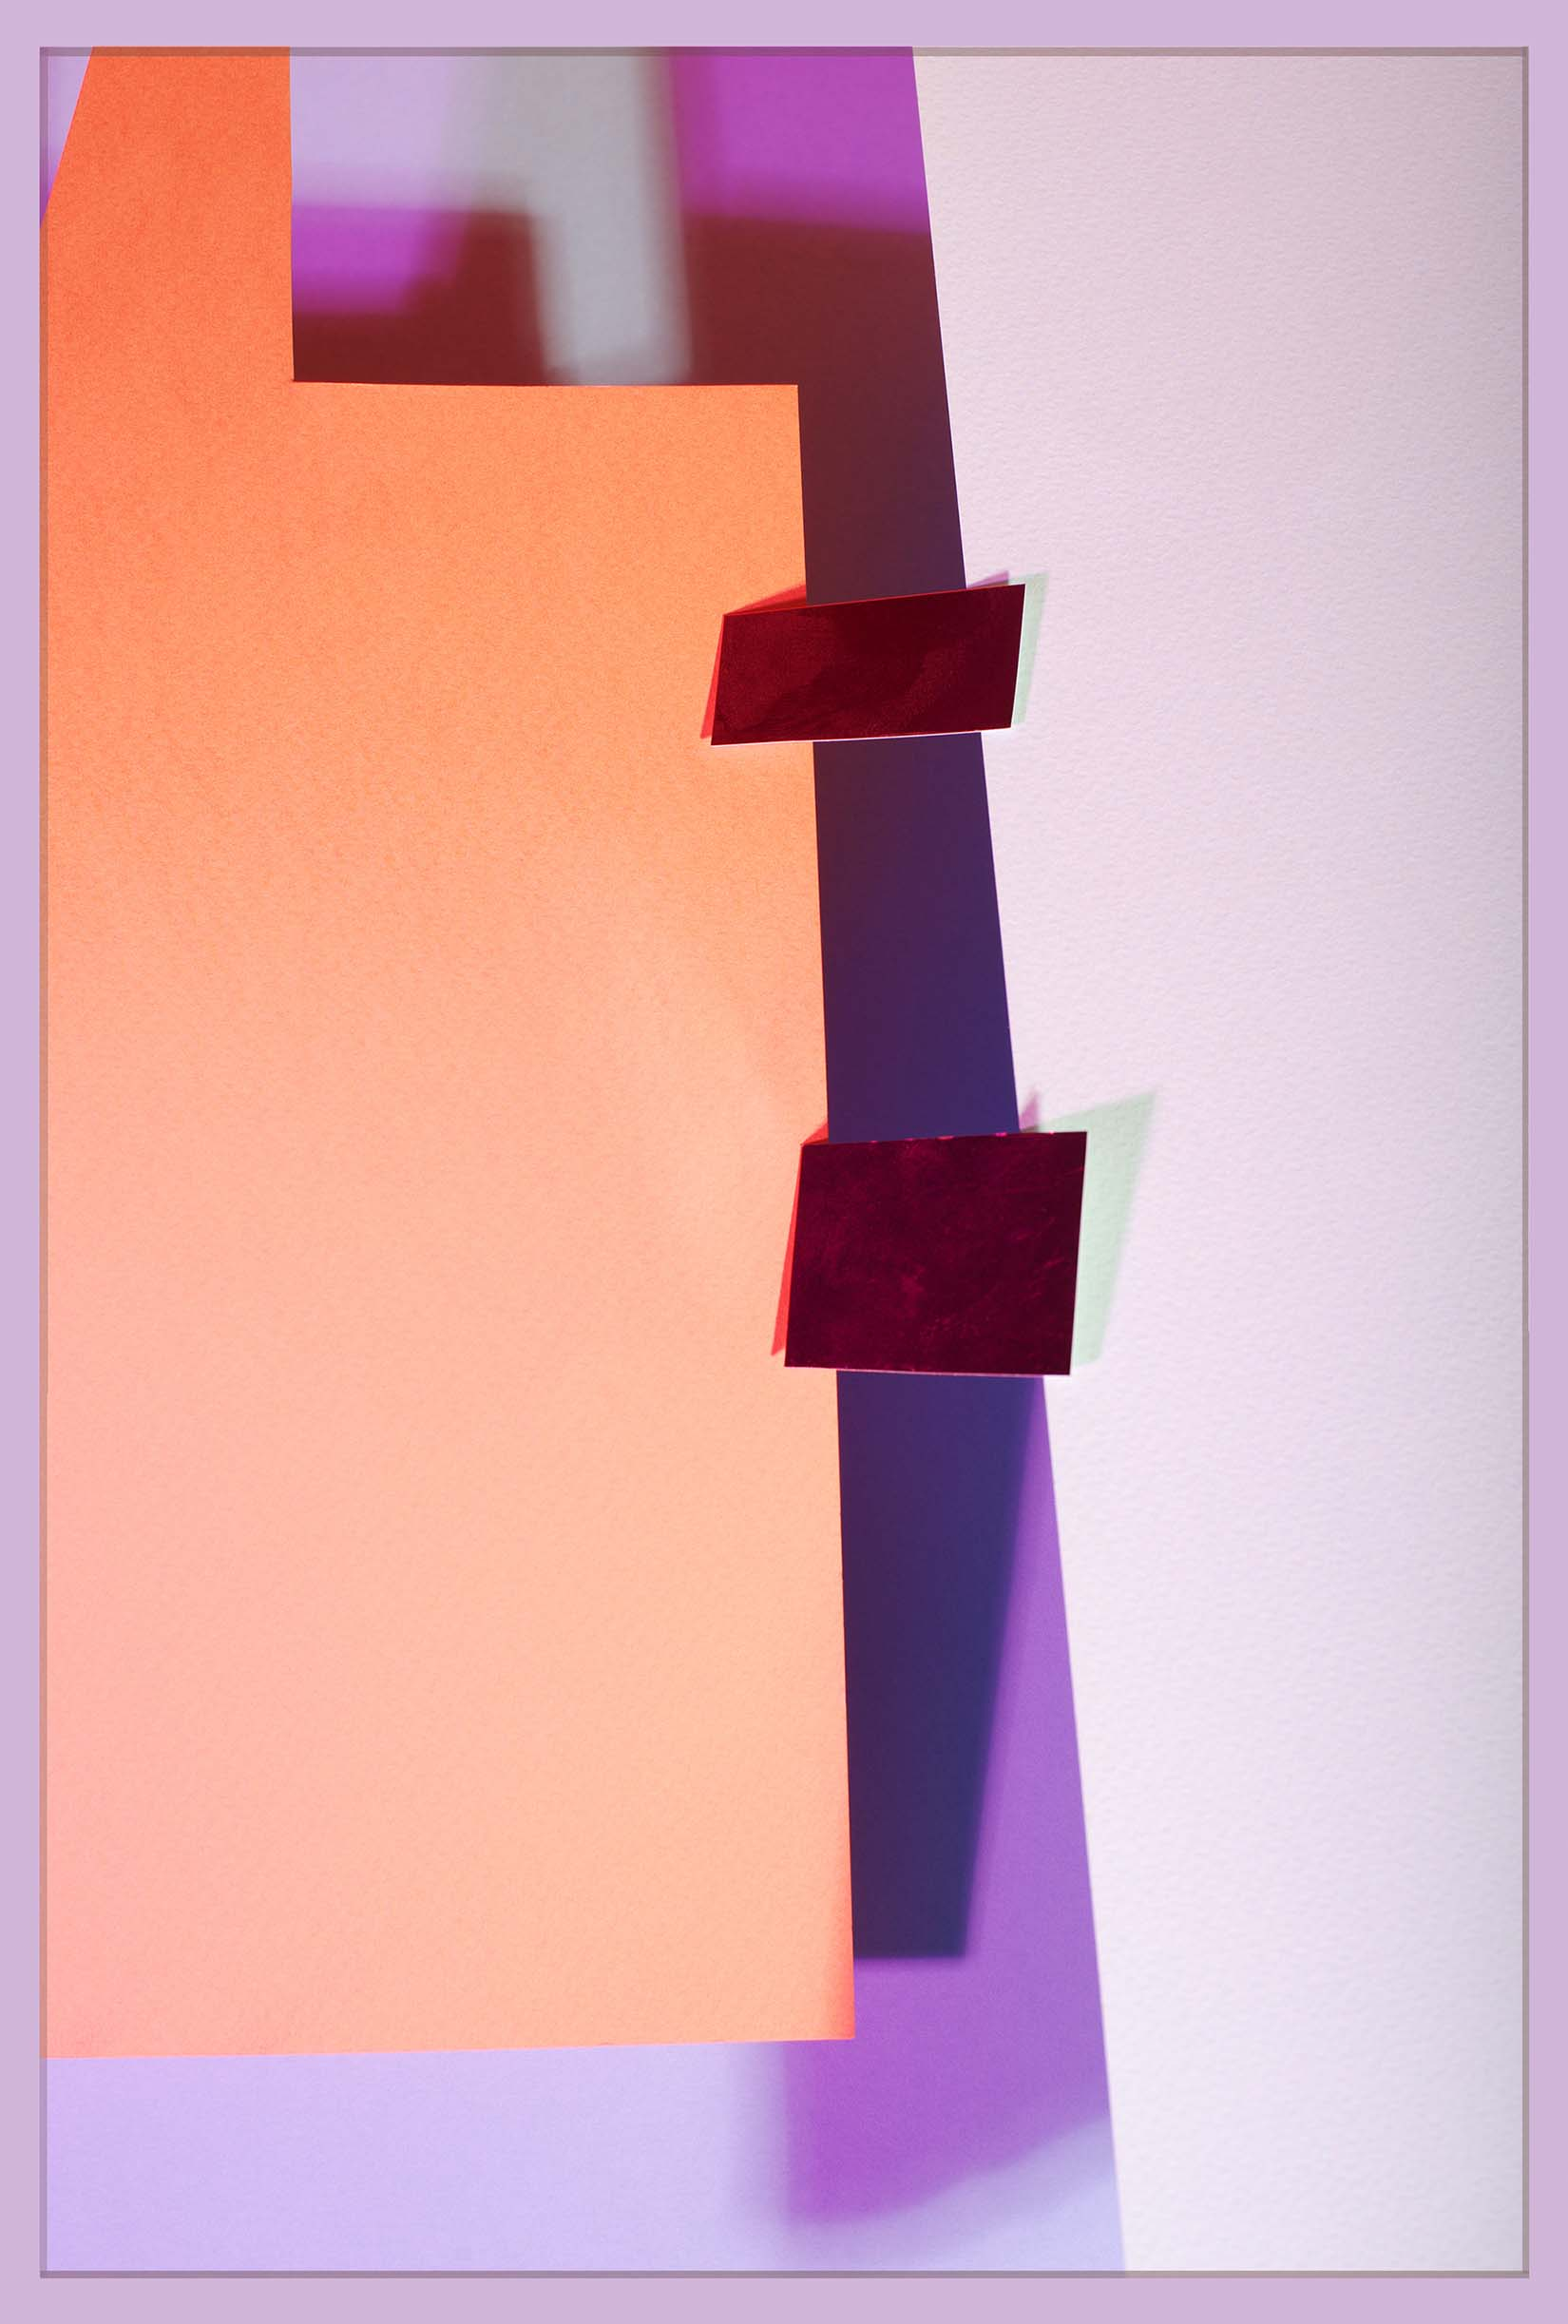 LYDIA WEGNER   Purple Square  2017 Archival inkjet print 80 x 53.5 cm